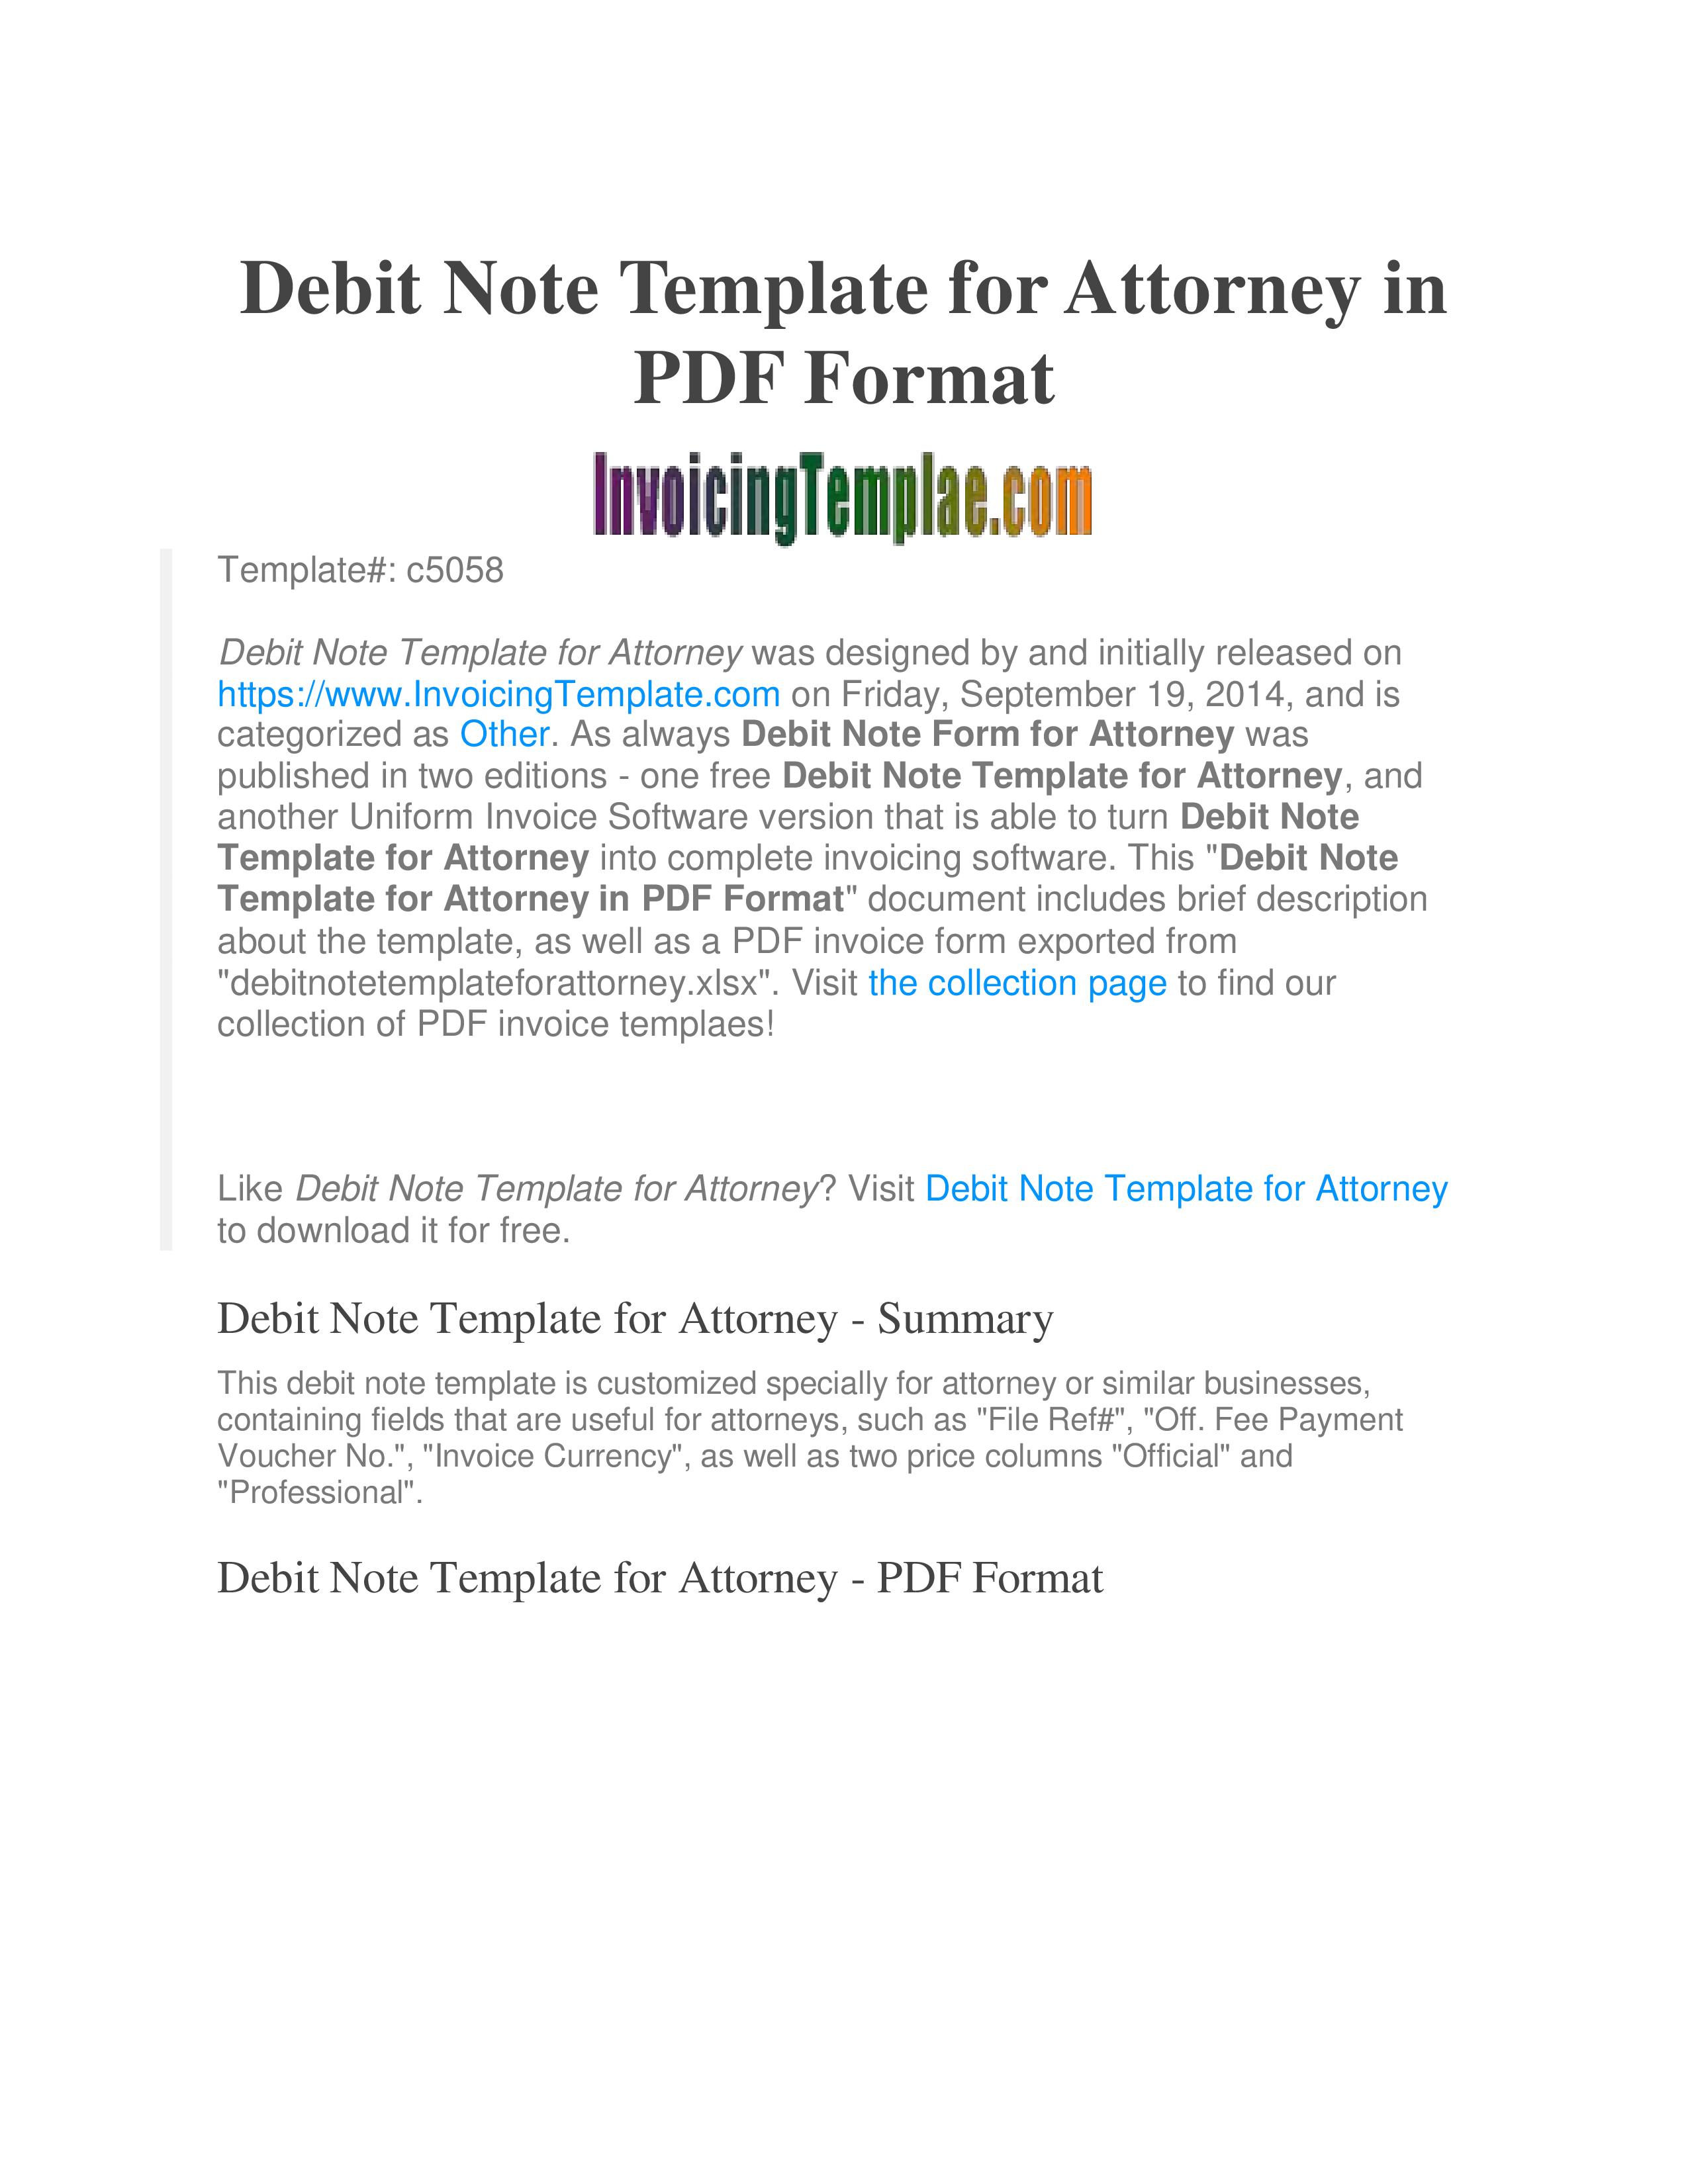 Debit Note Template For Attorney